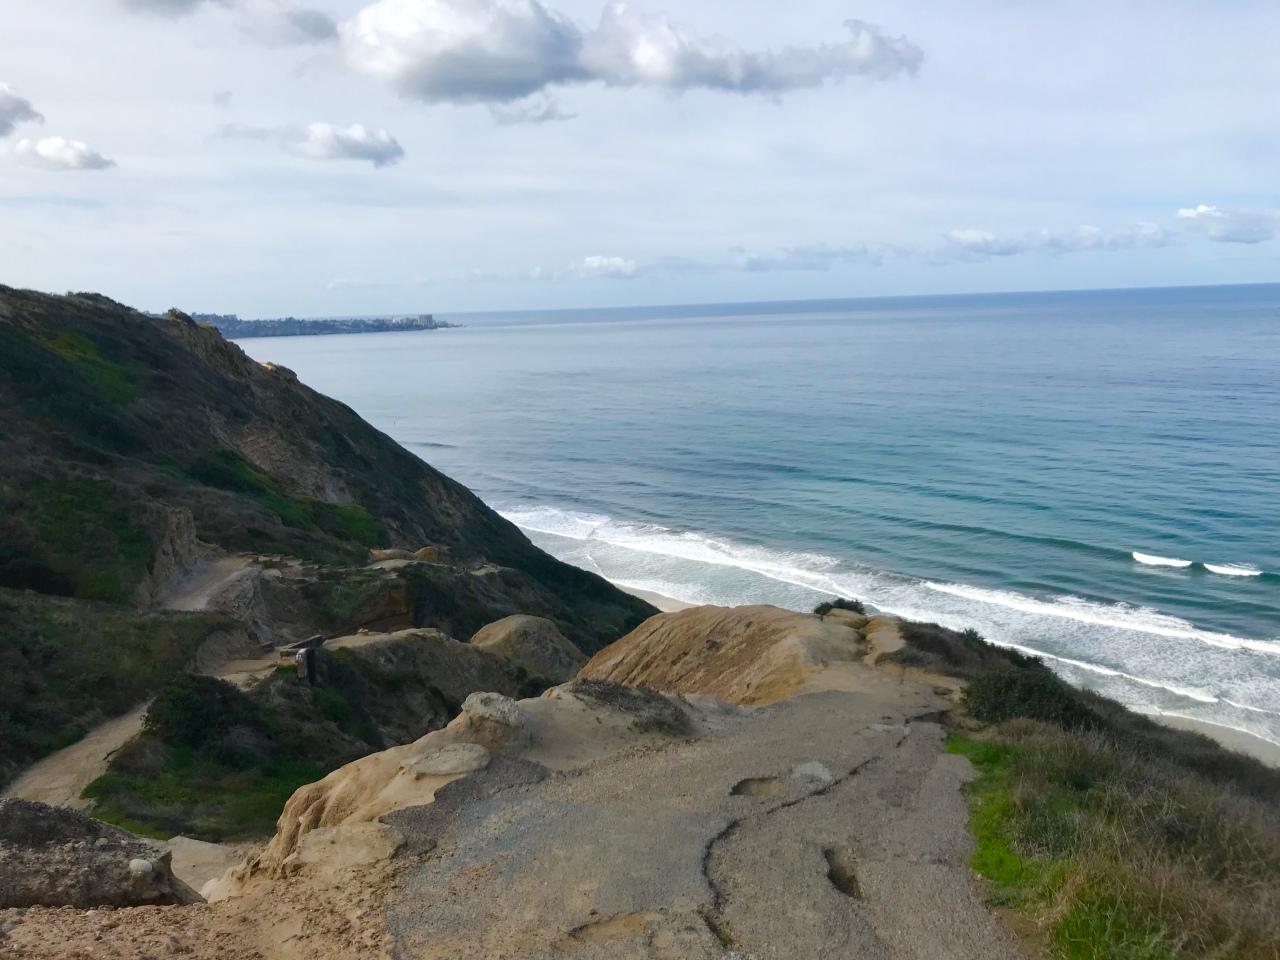 Ho Chi Minh Trail & La Jolla –California